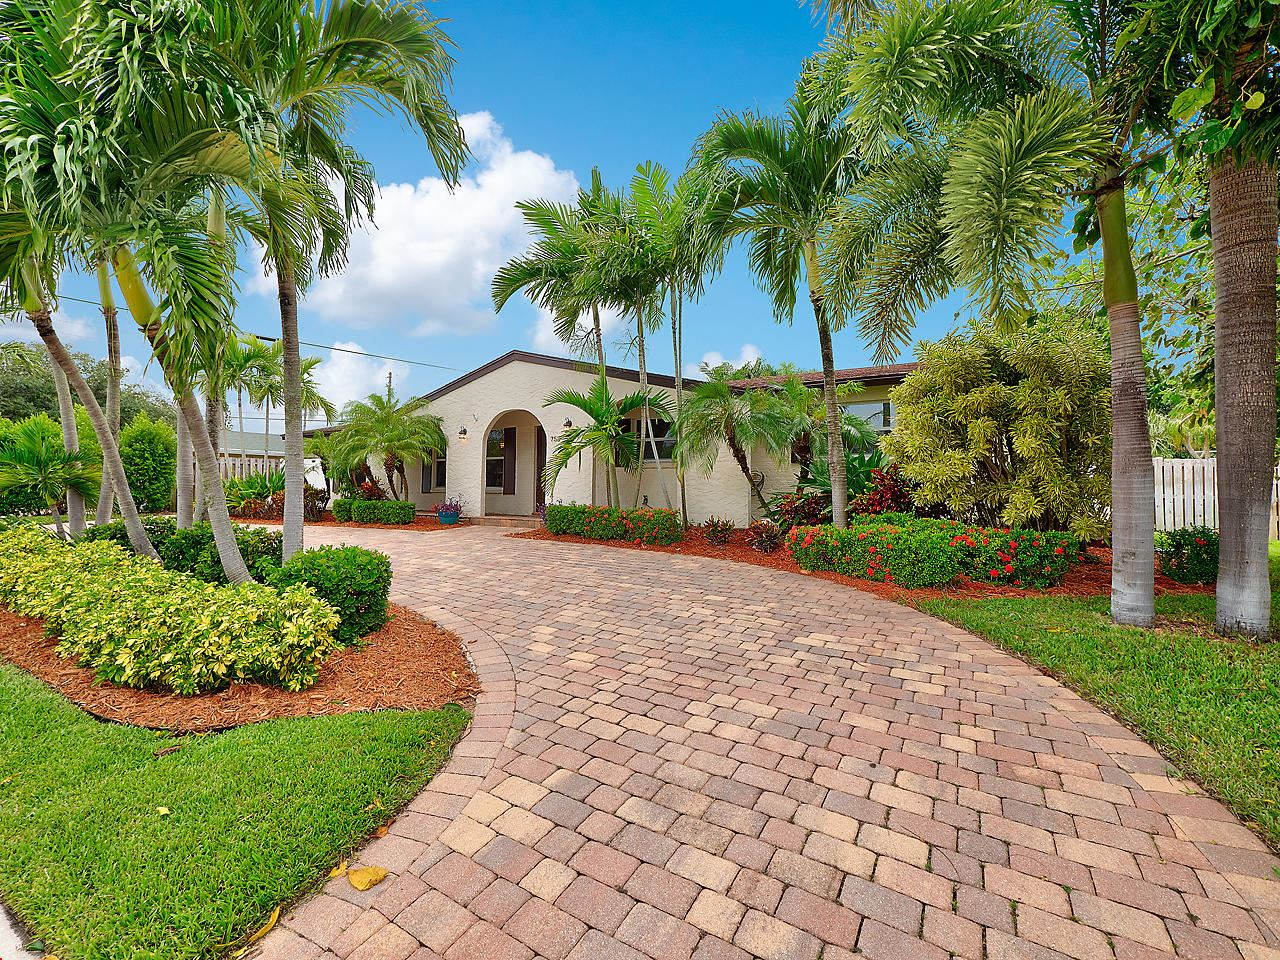 Photo of 753 Dogwood Road, North Palm Beach, FL 33408 (MLS # RX-10657462)